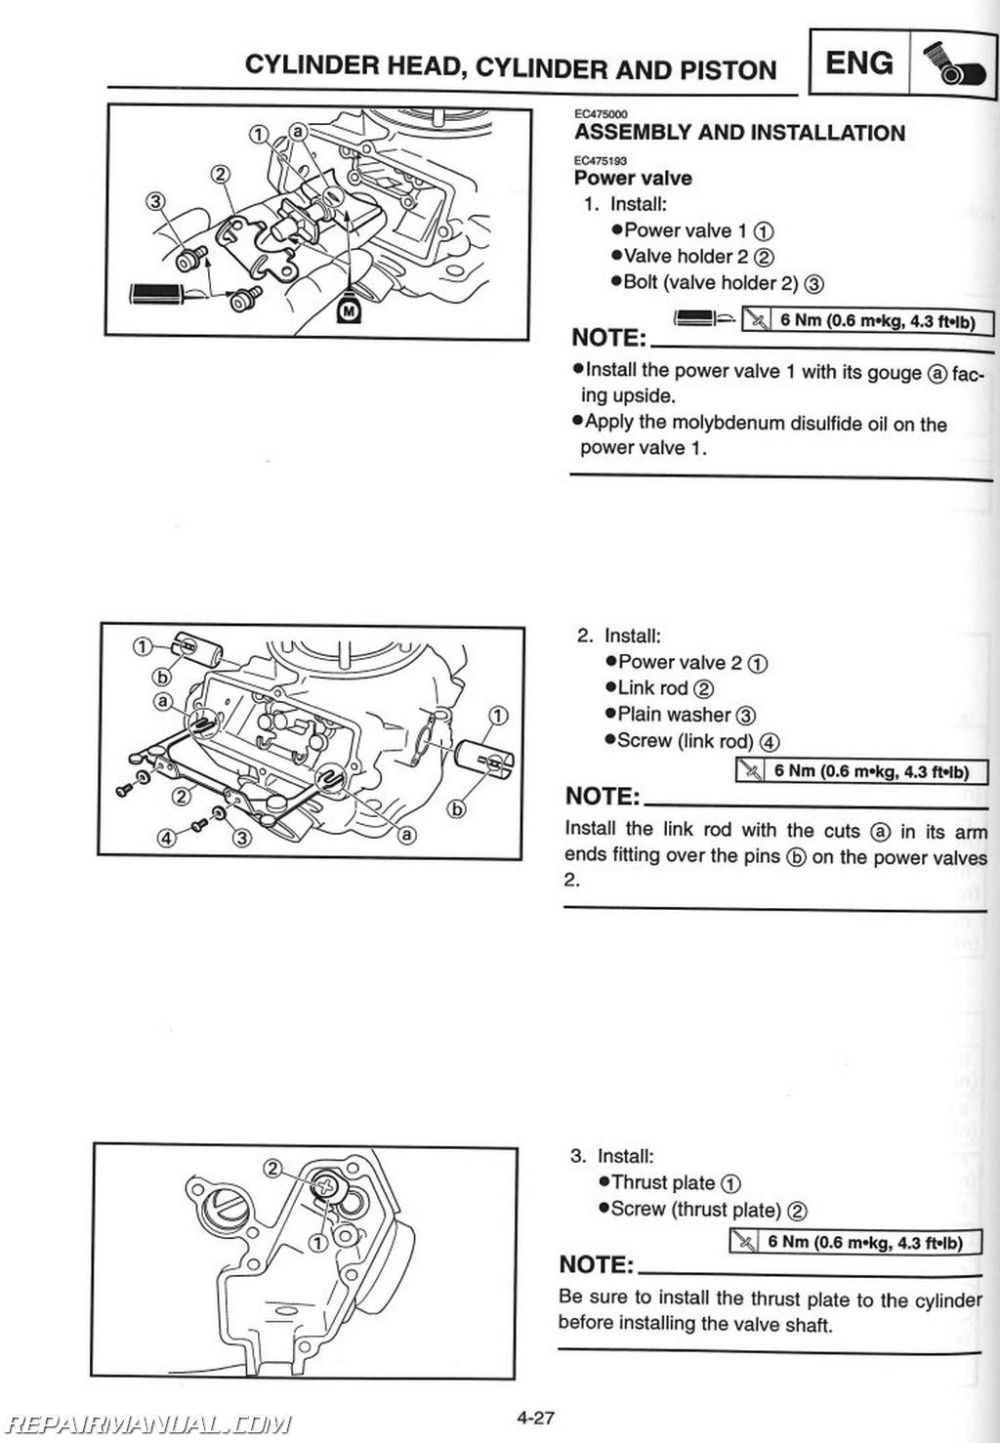 Yamaha Yz 250 Wiring Diagram - yz250 wiring diagram wiring ... on